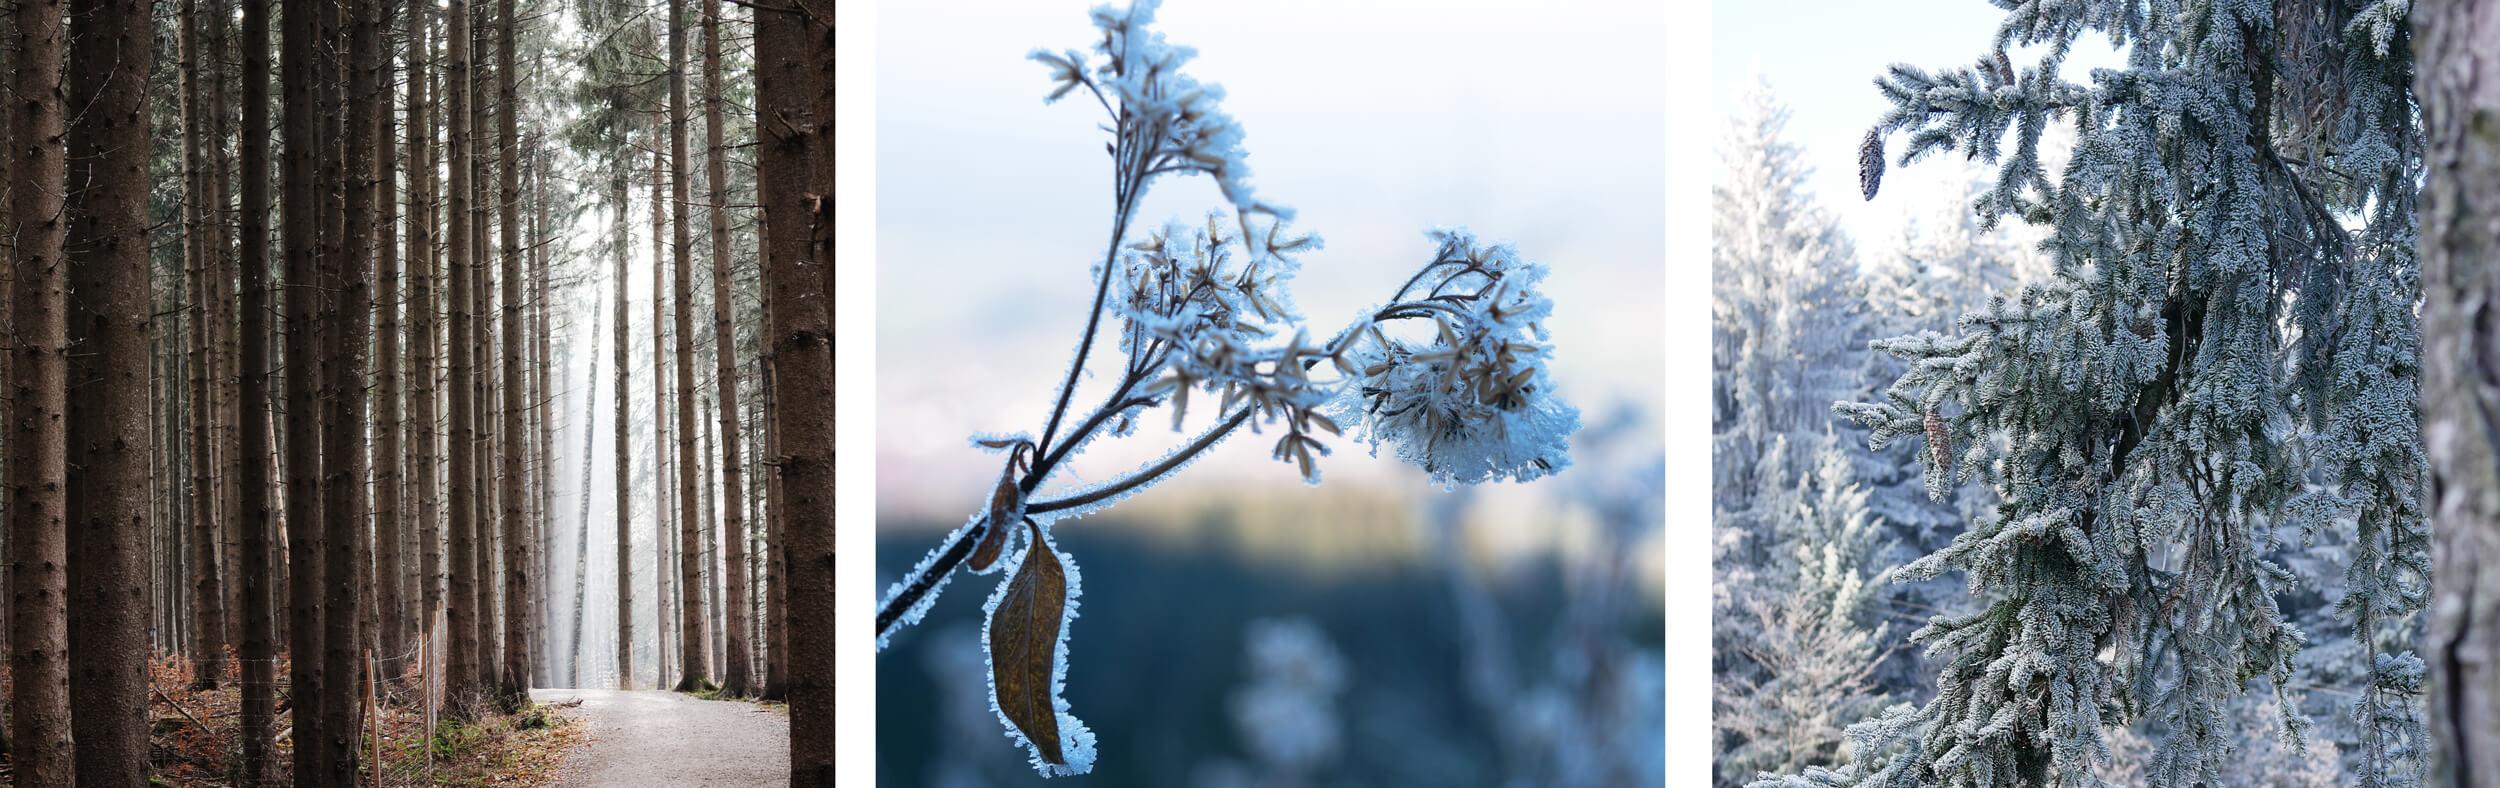 Hörnle Frost Natur